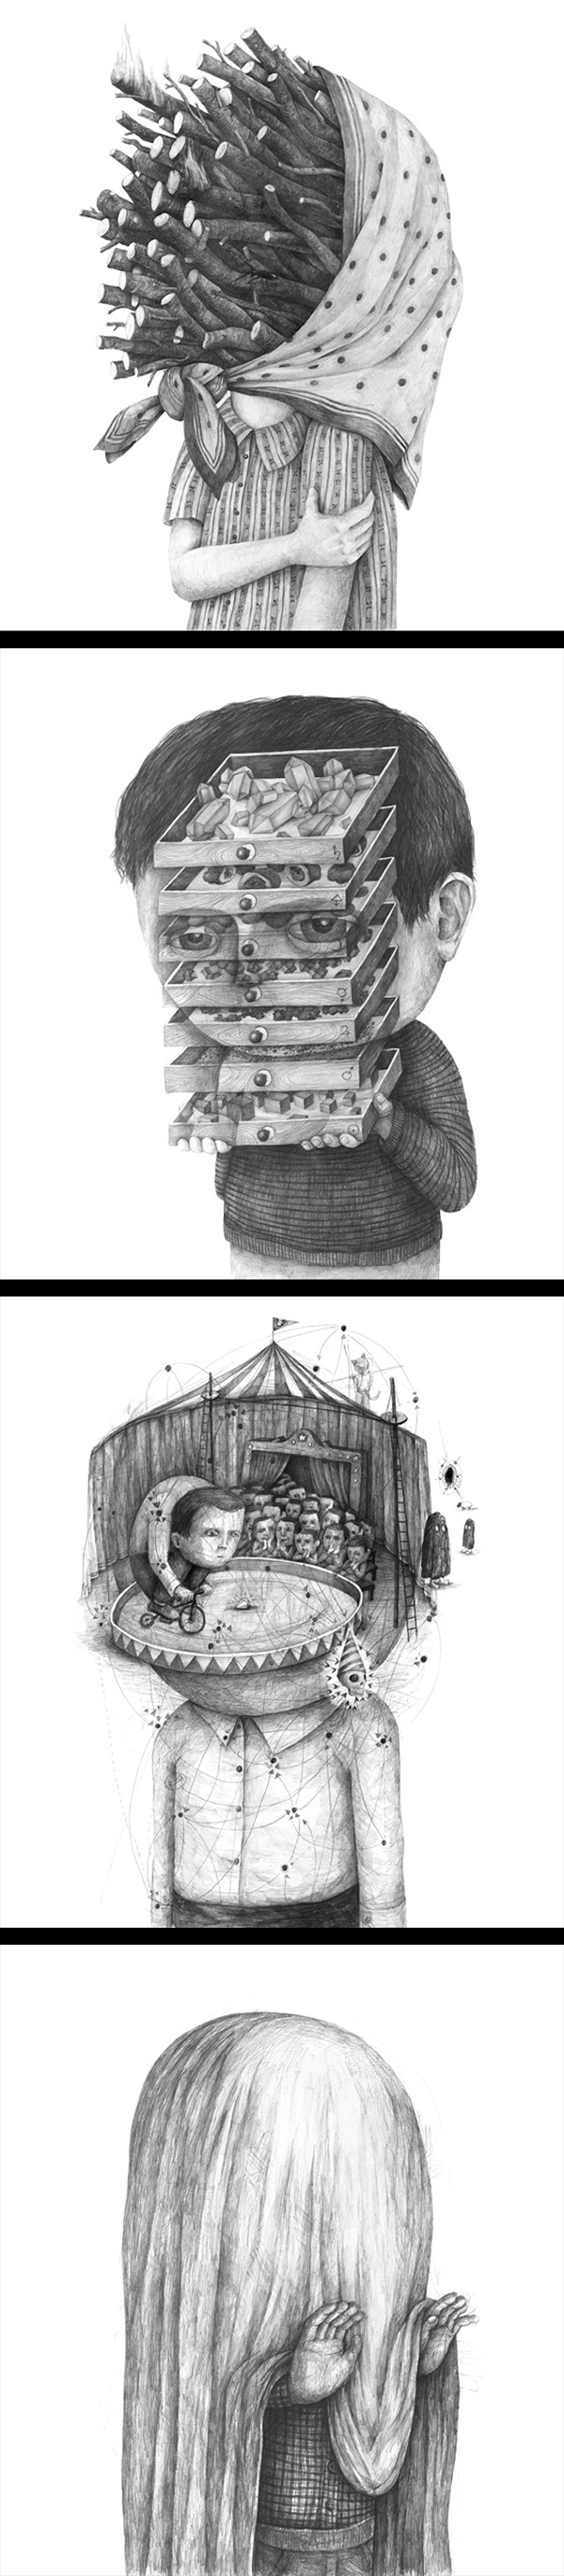 Inspirations graphiques #15 Stefan Zsaitsits | Surrealistic Drawings